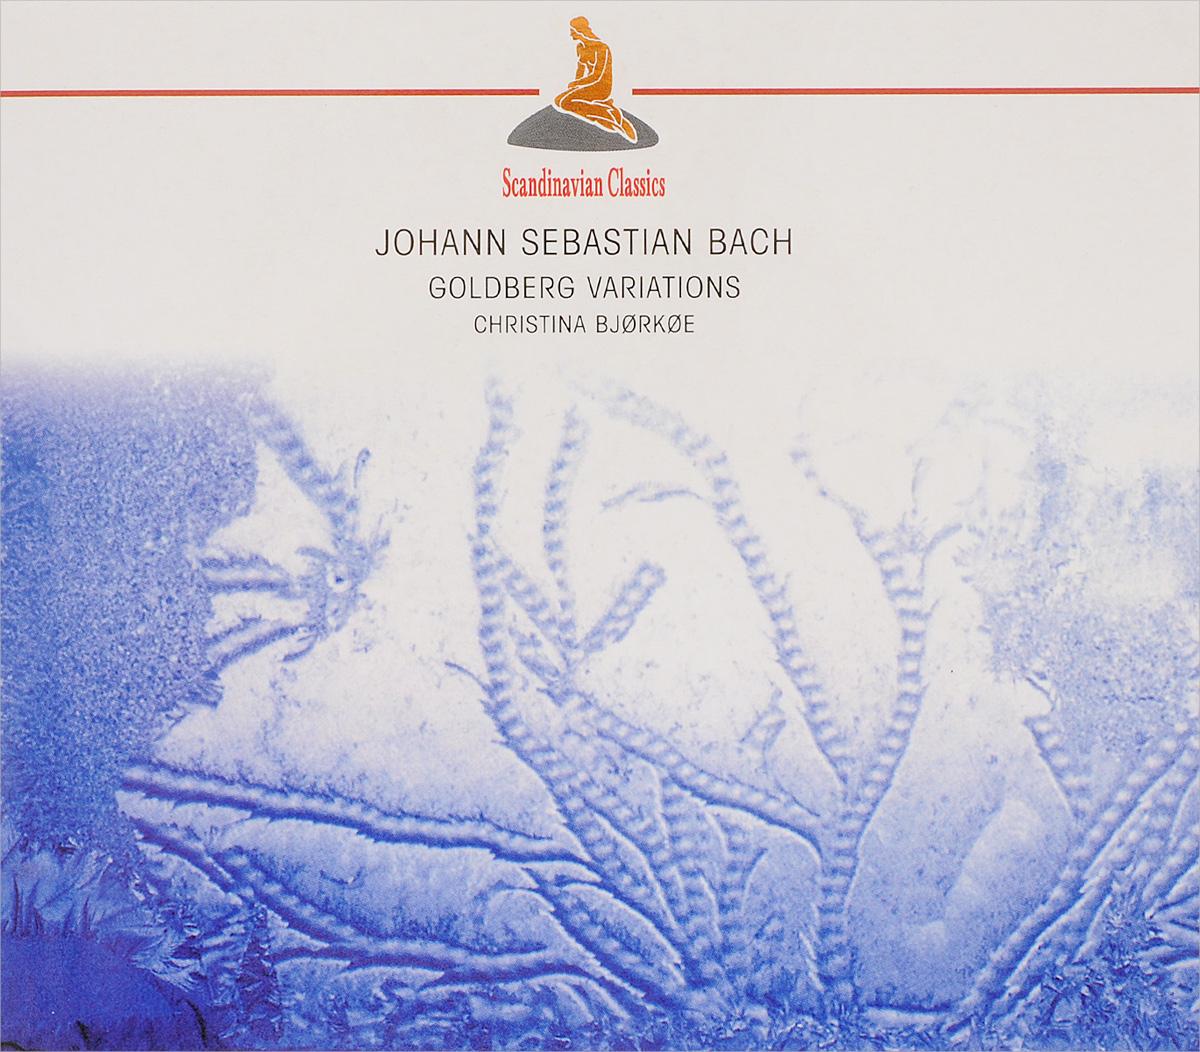 лучшая цена Christina Bjorkoe Scandinavian Classics. Christina Bjorkoe. Johann Sebastian Bach. Goldberg Variations